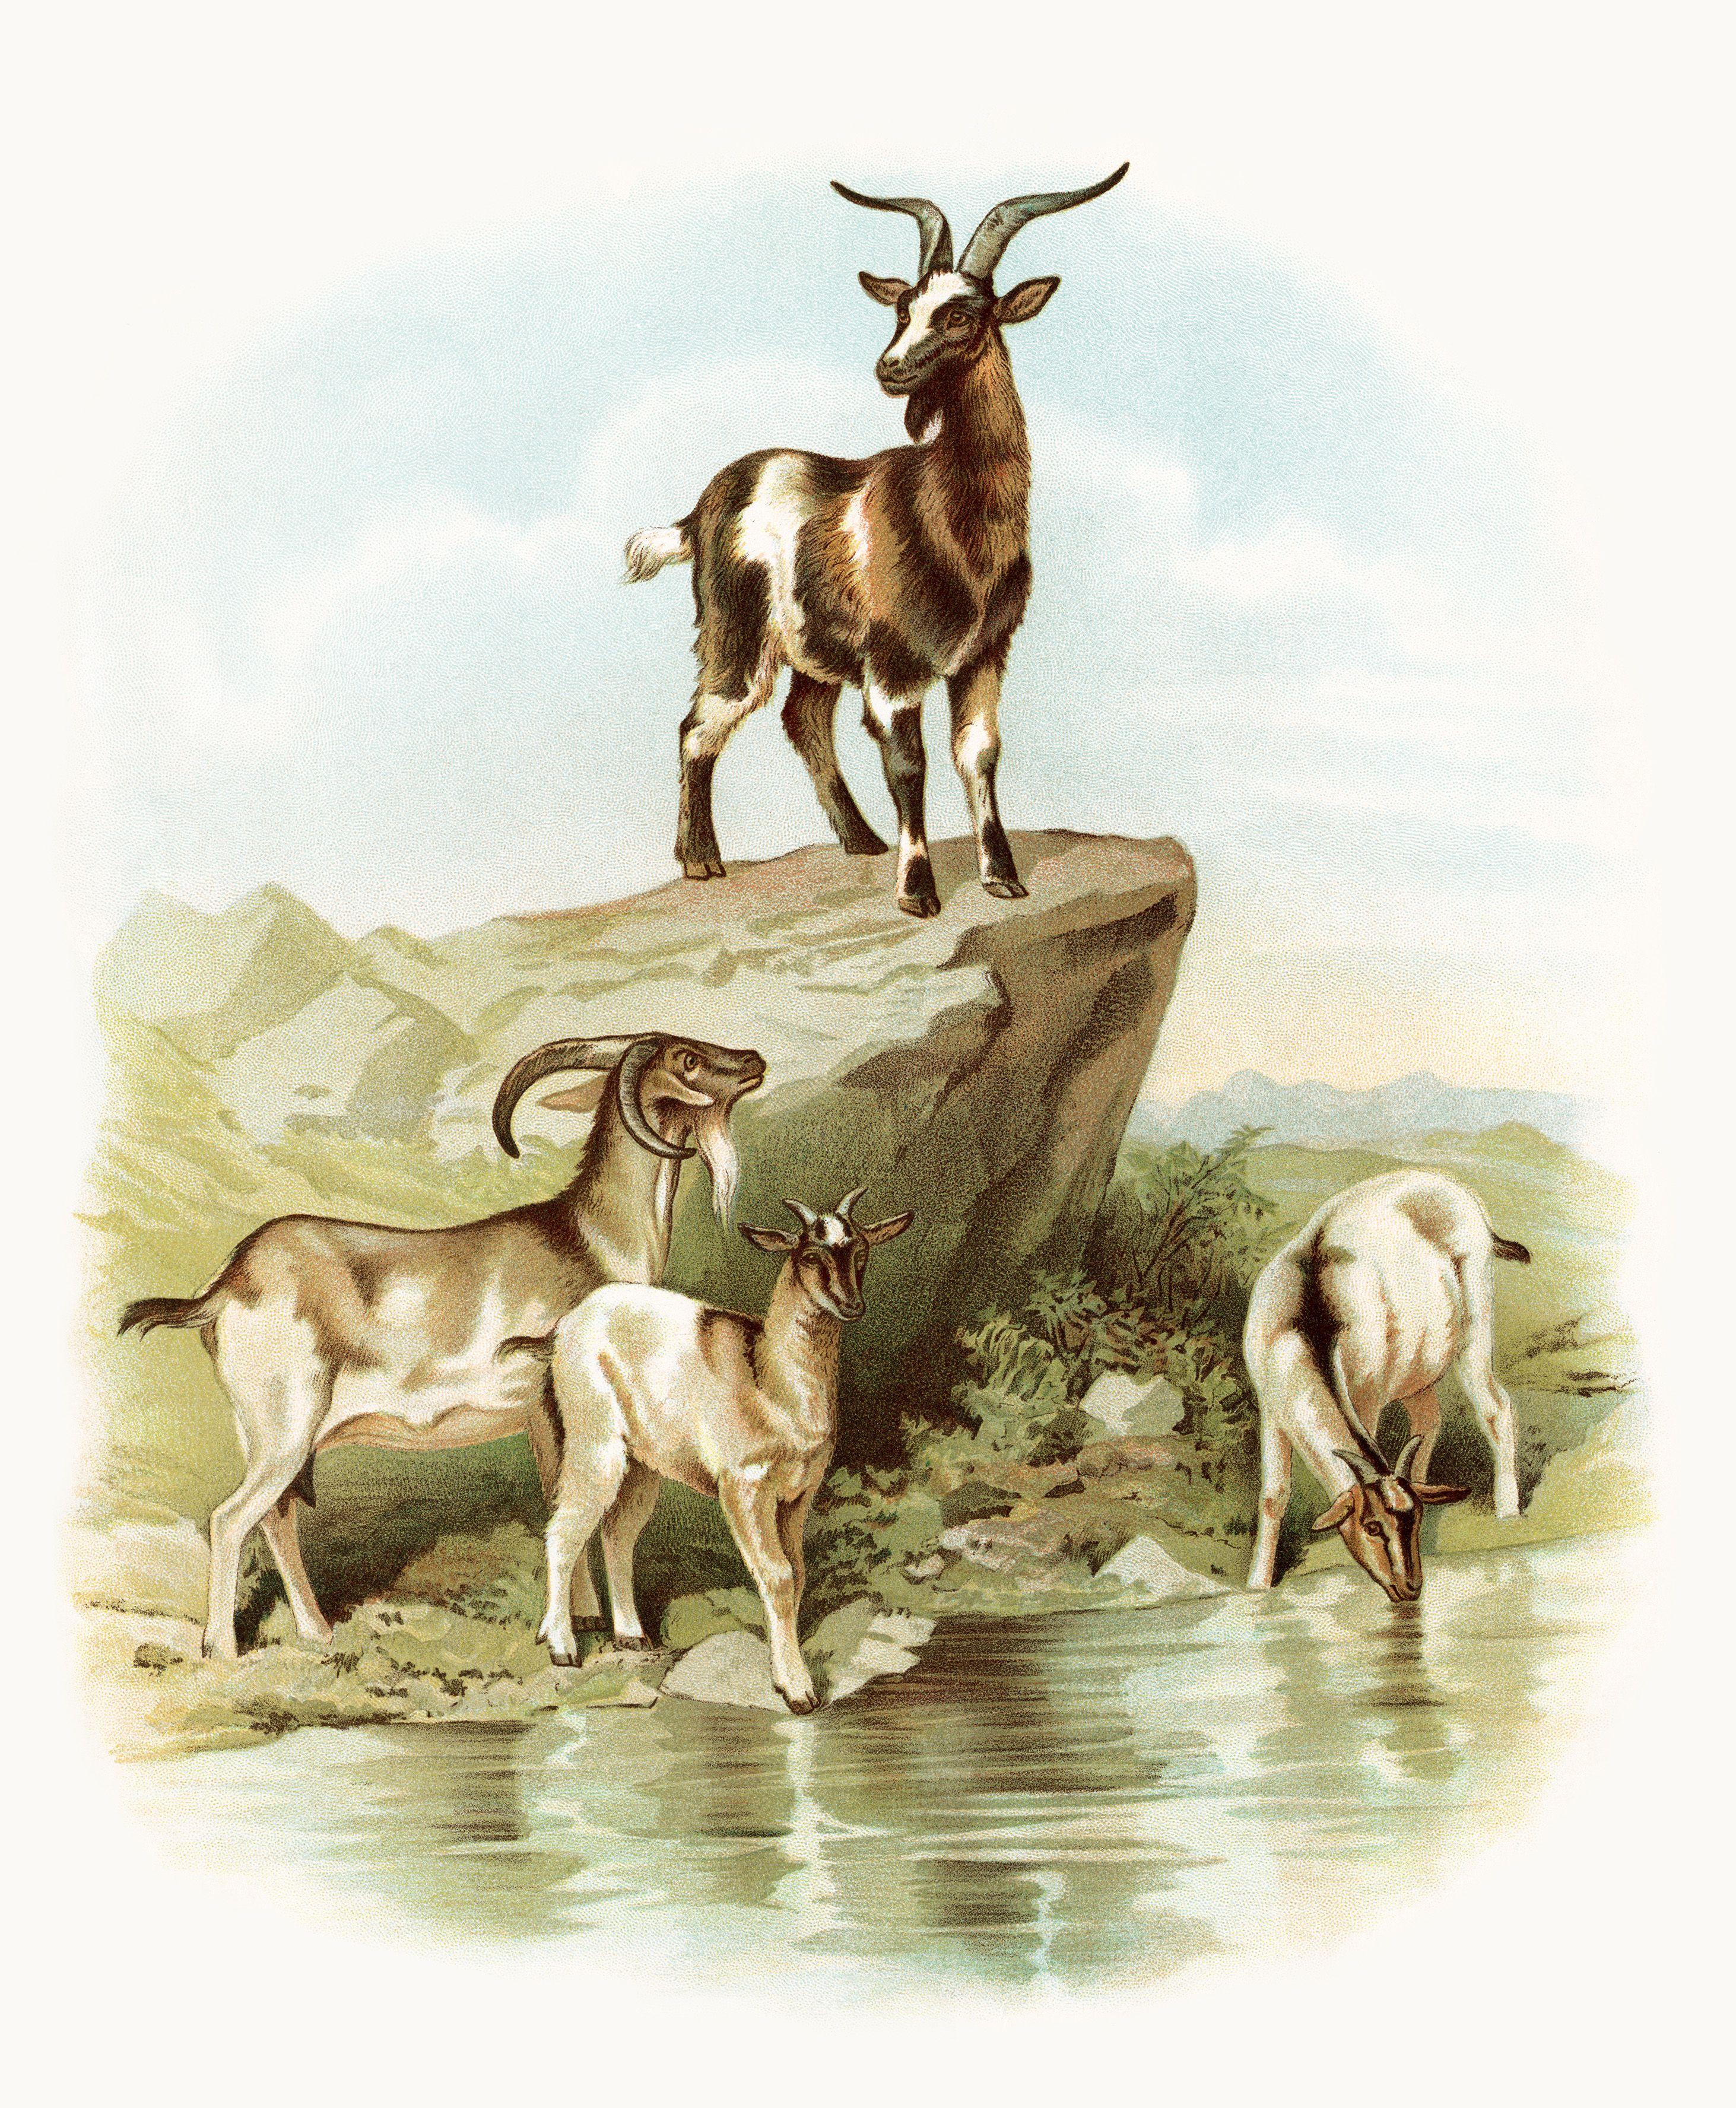 Free Vintage Image Goats at the Farm Animal printables